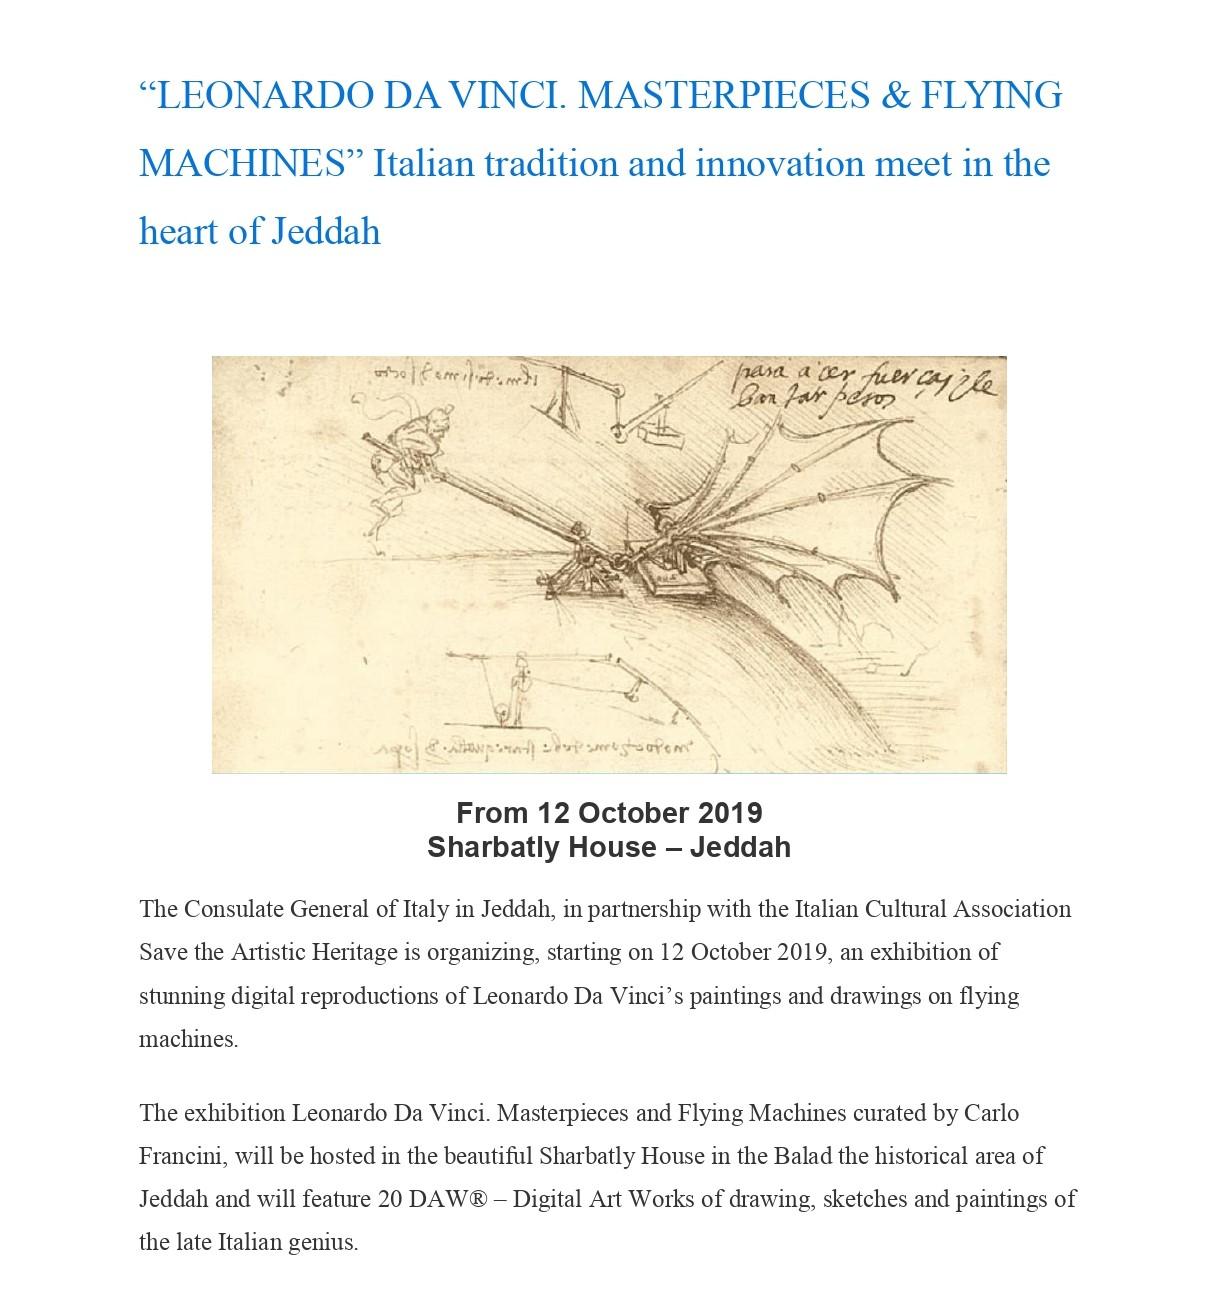 """LEONARDO DA VINCI. MASTERPIECES & FLYING MACHINES"" Italian tradition and innovation meet in the heart of Jeddah"